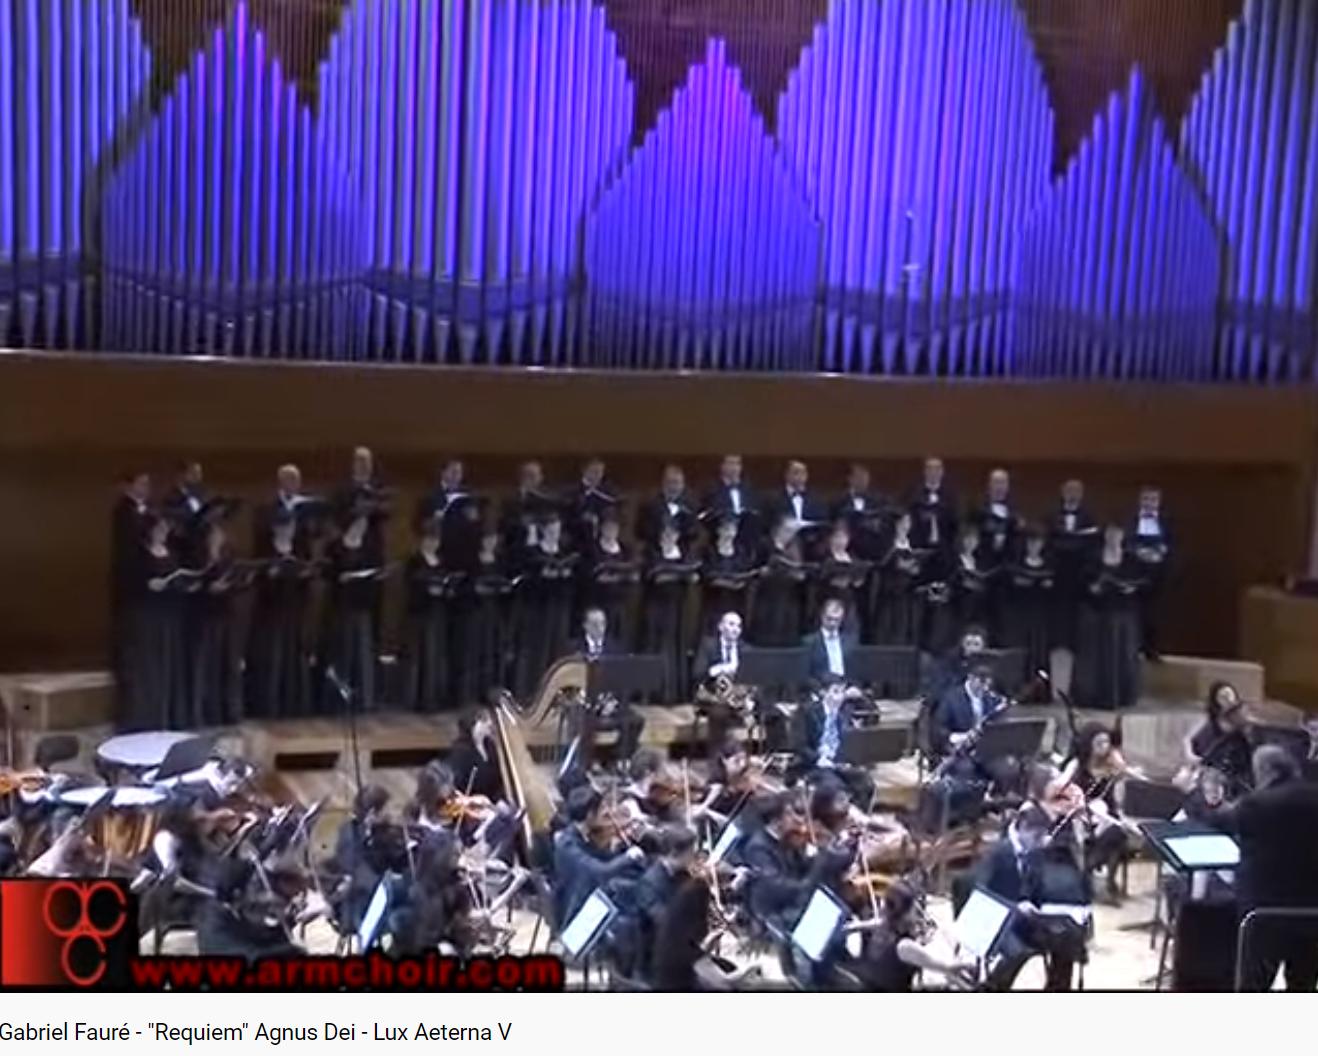 Fauré Requiem Agnus Dei